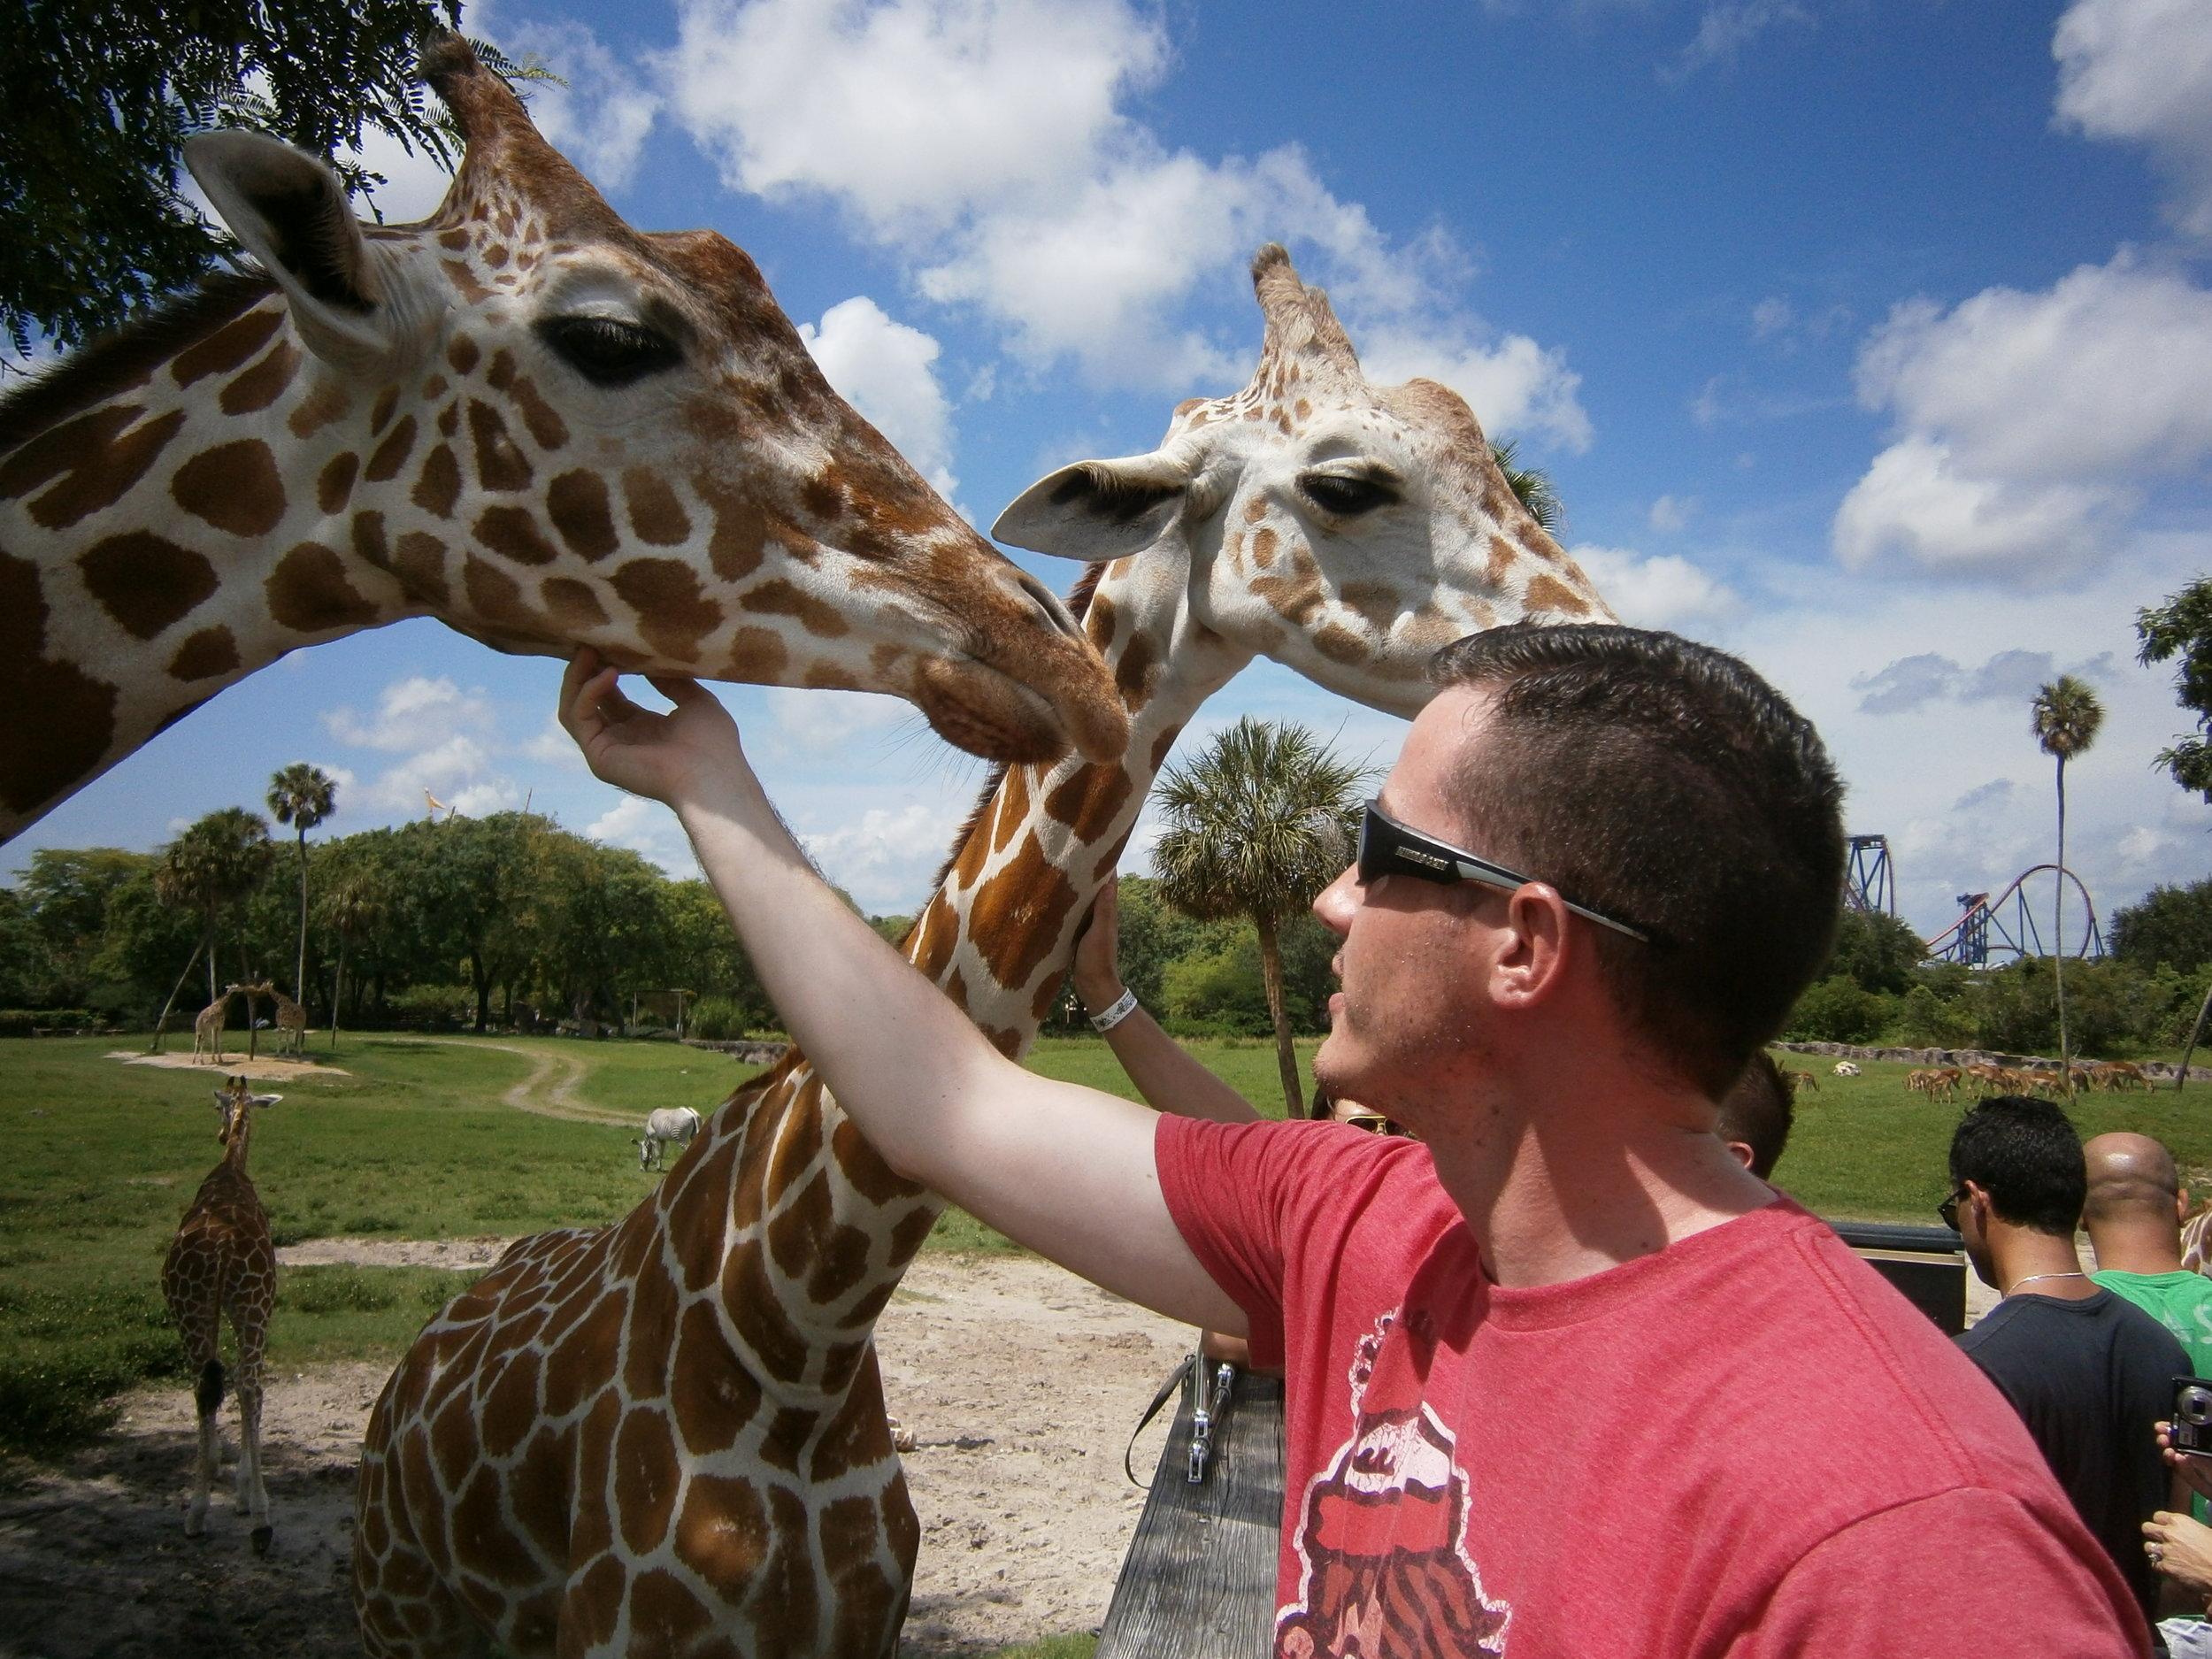 Feeding and petting giraffes in Tampa